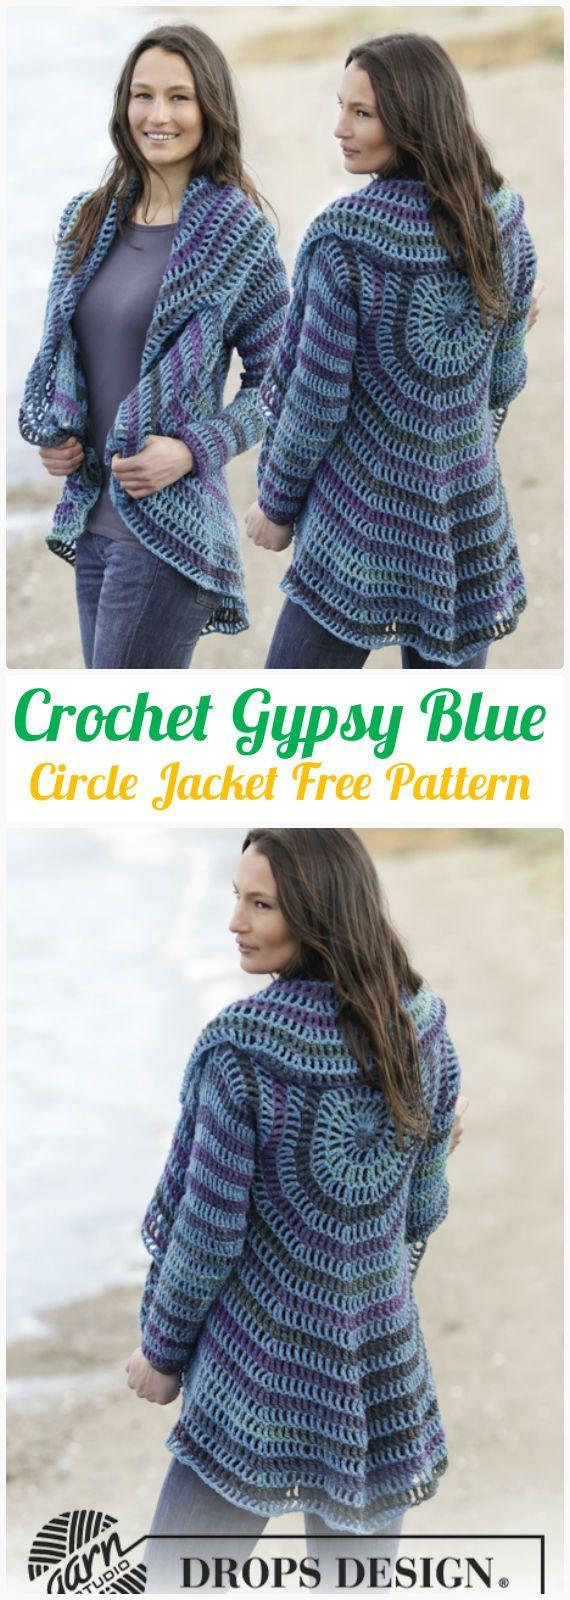 Diy crochet circular vest sweater jacket free patterns crochet diy crochet circular vest sweater jacket free patterns bankloansurffo Image collections